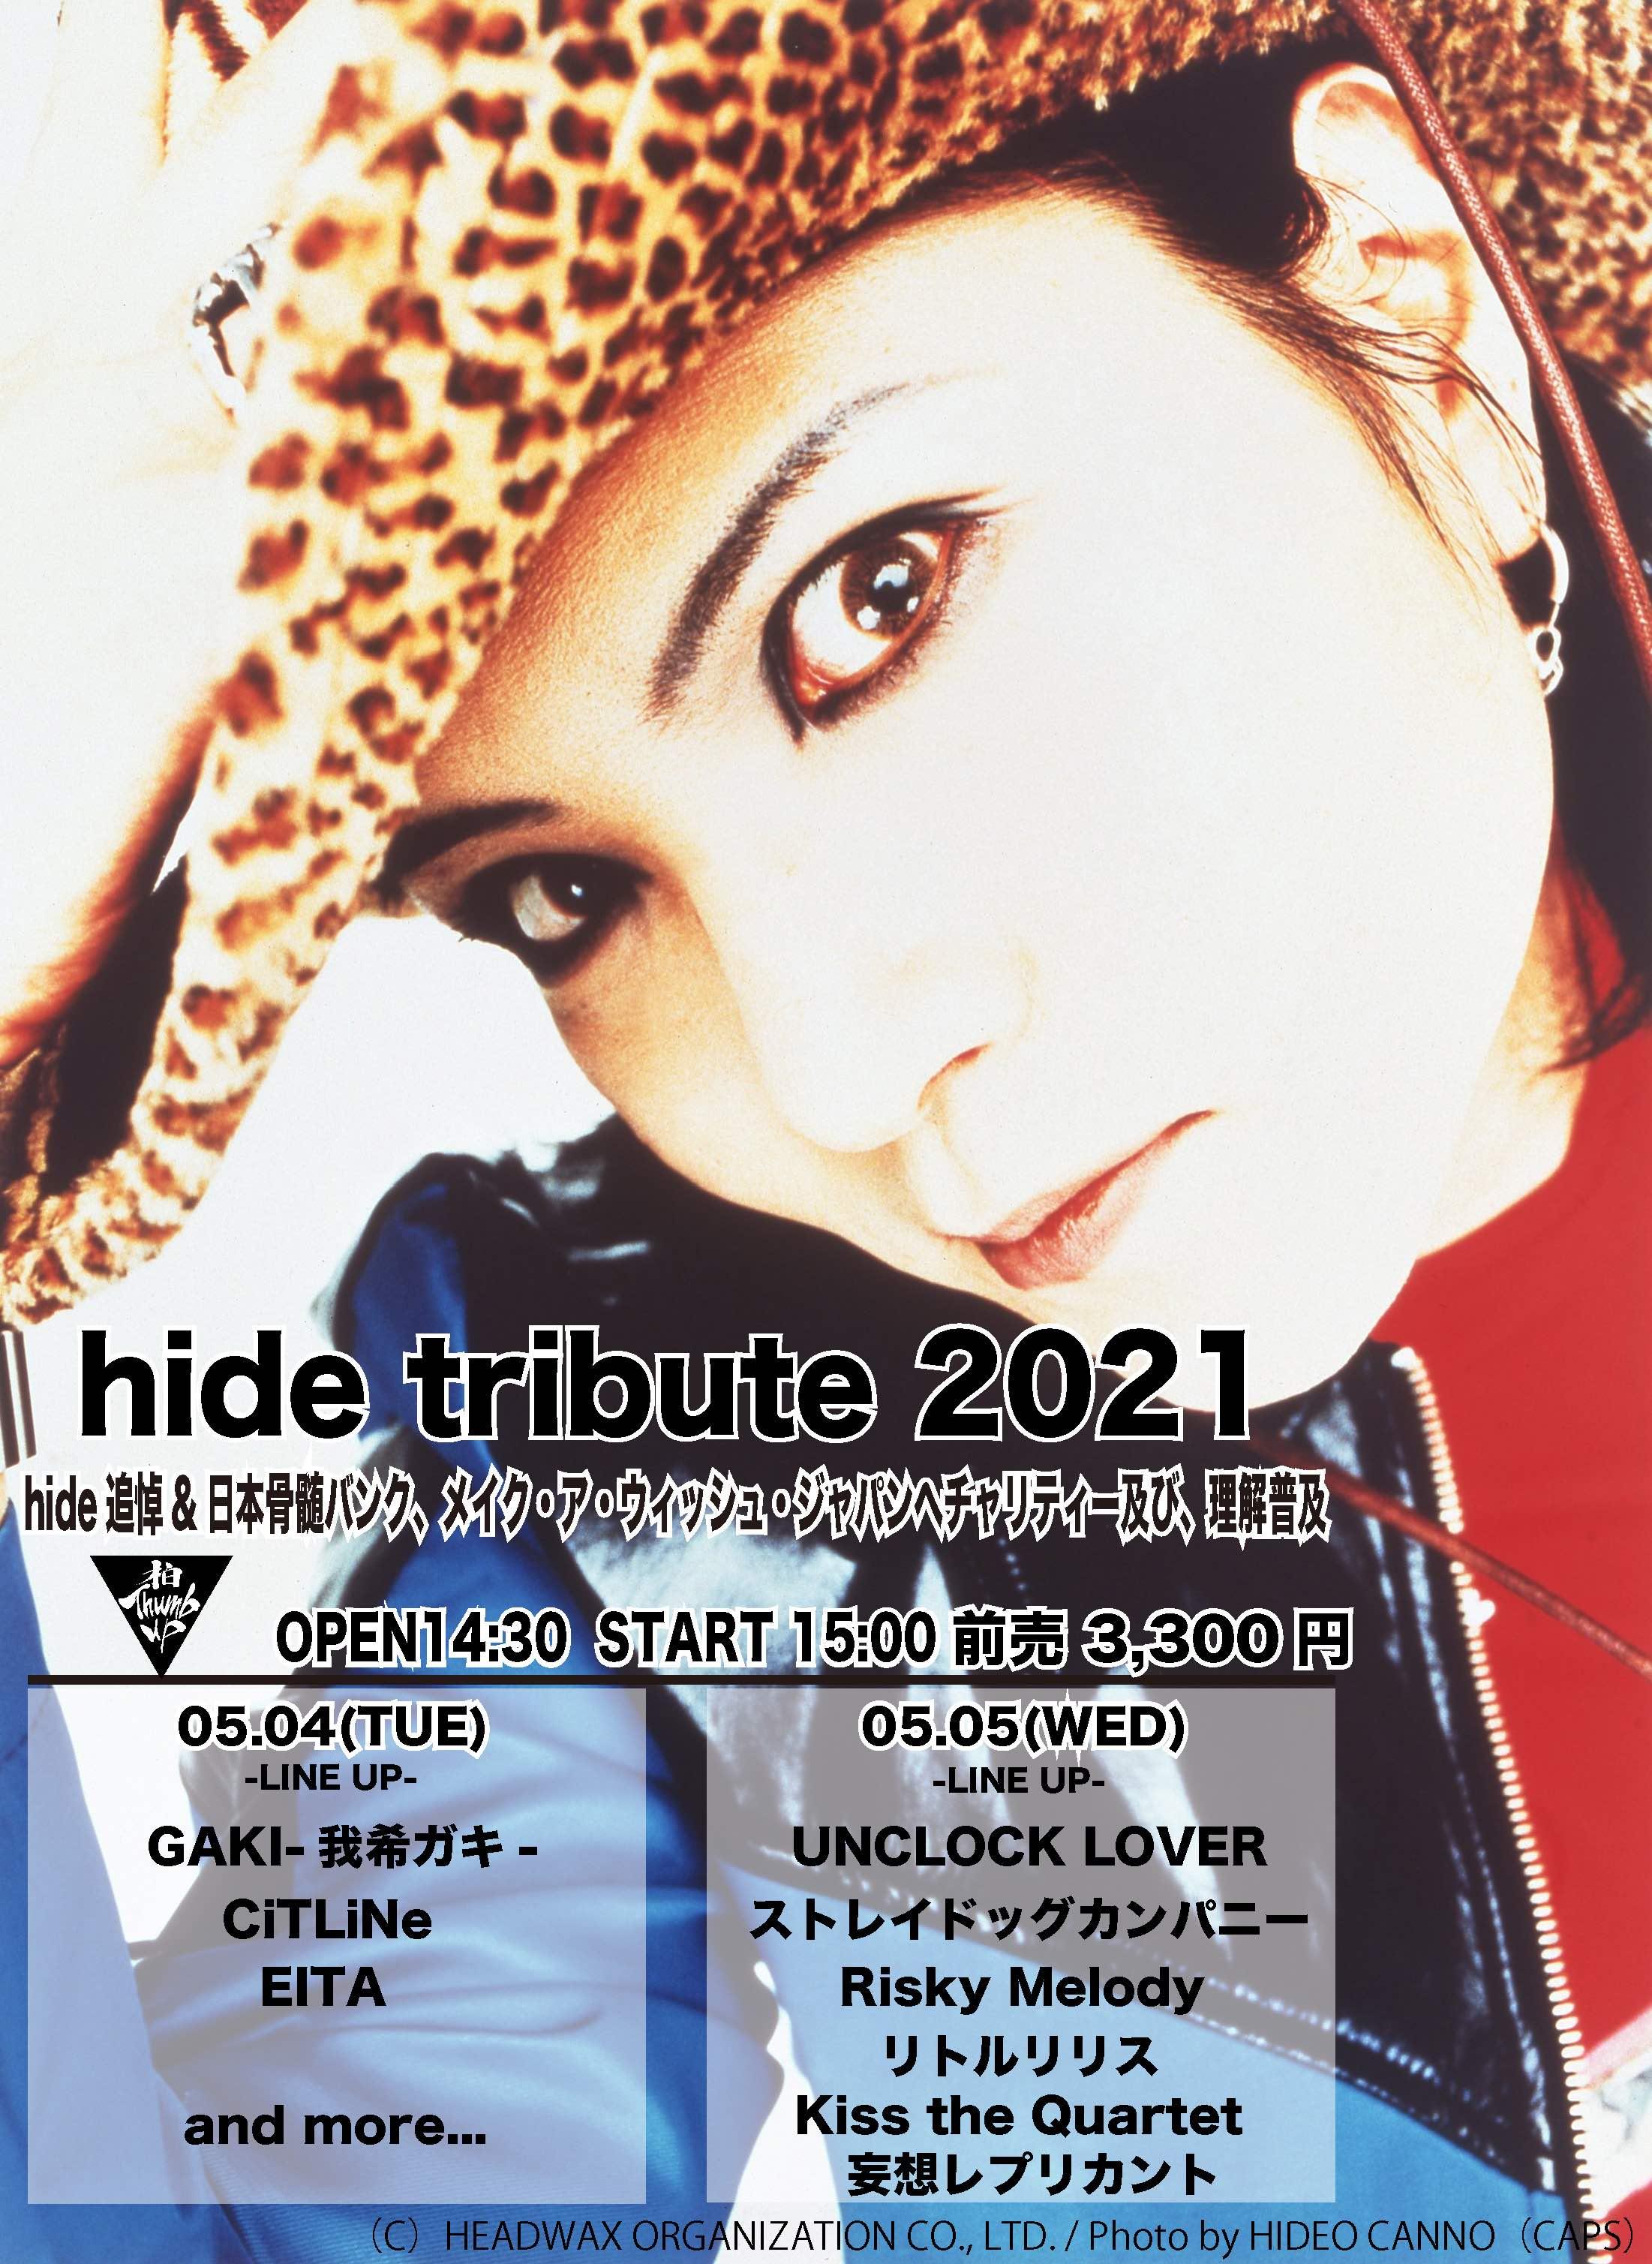 hide tribute 2021 〜hide追悼&日本骨髄バンク、メイク・ア・ウィッシュ・ジャパンへのチャリティー及び、理解普及〜